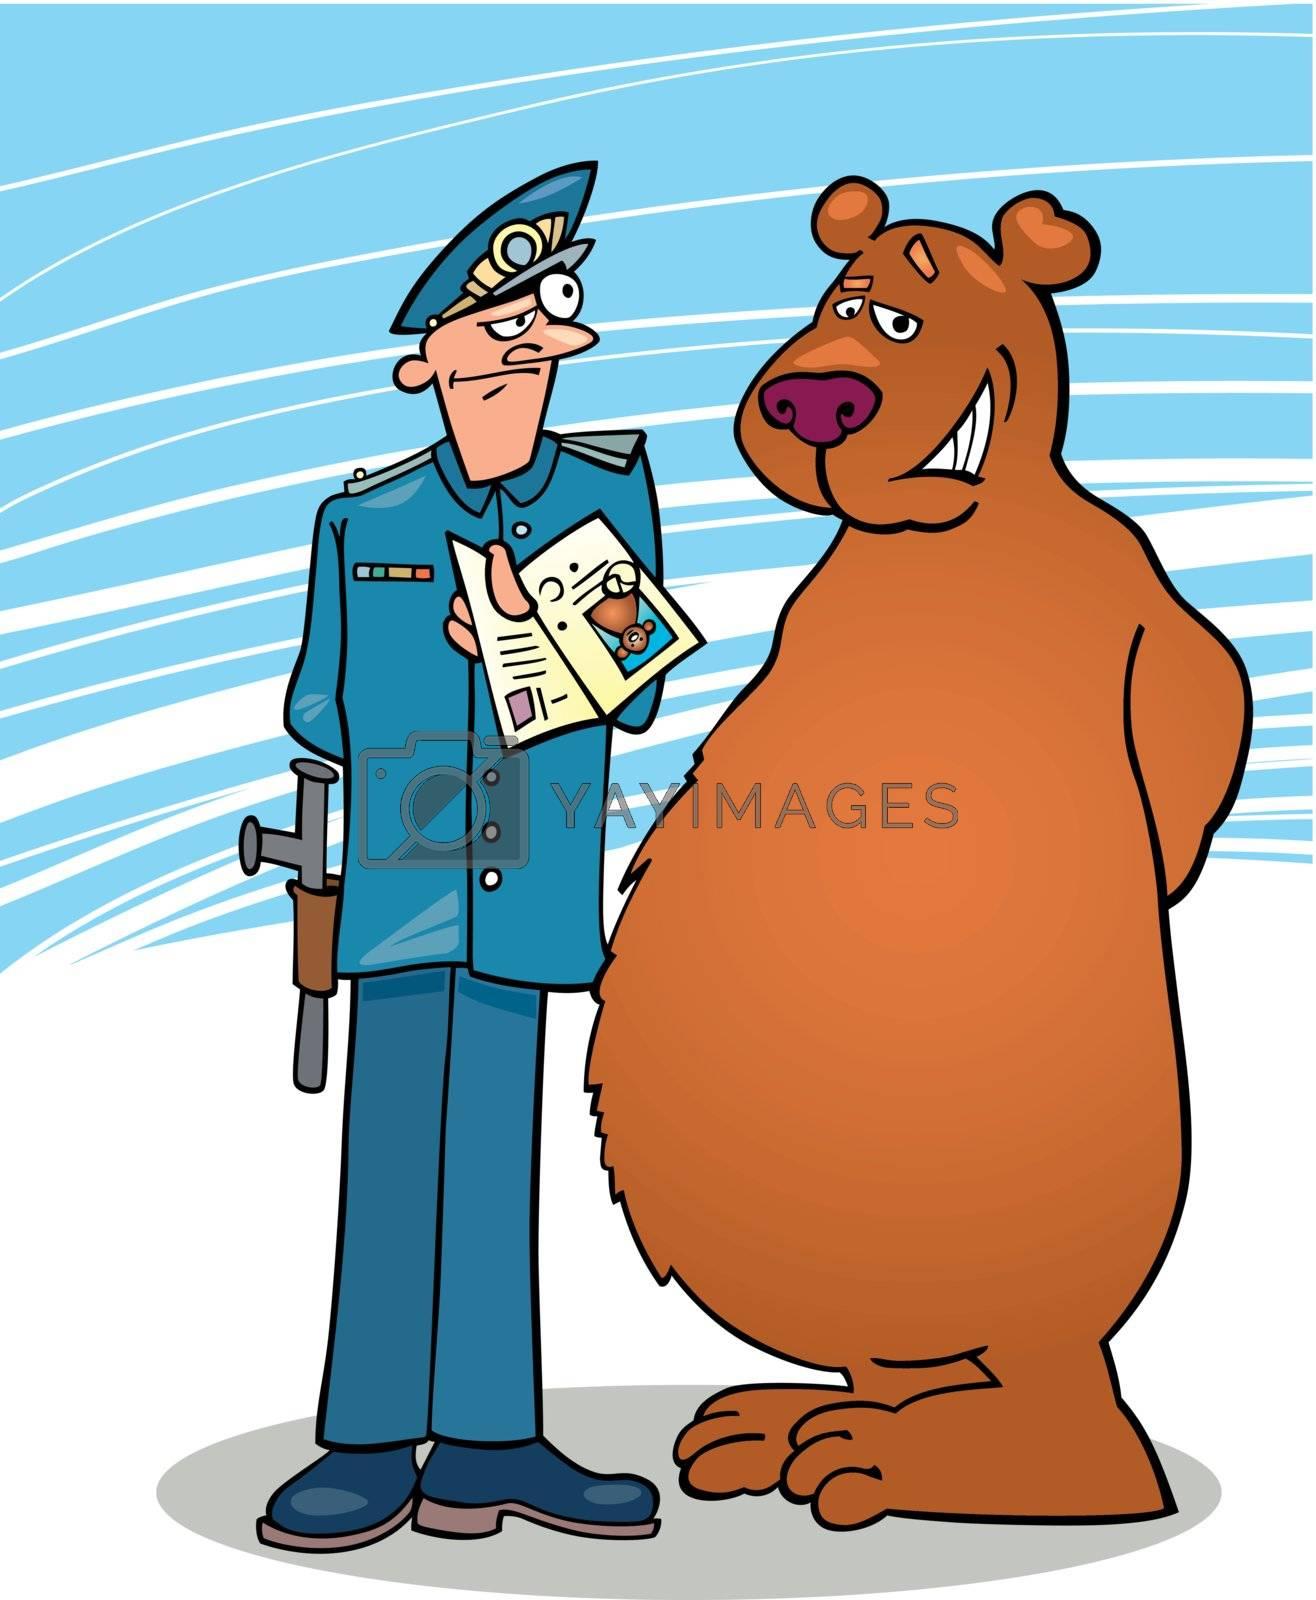 Royalty free image of bear and policeman by izakowski